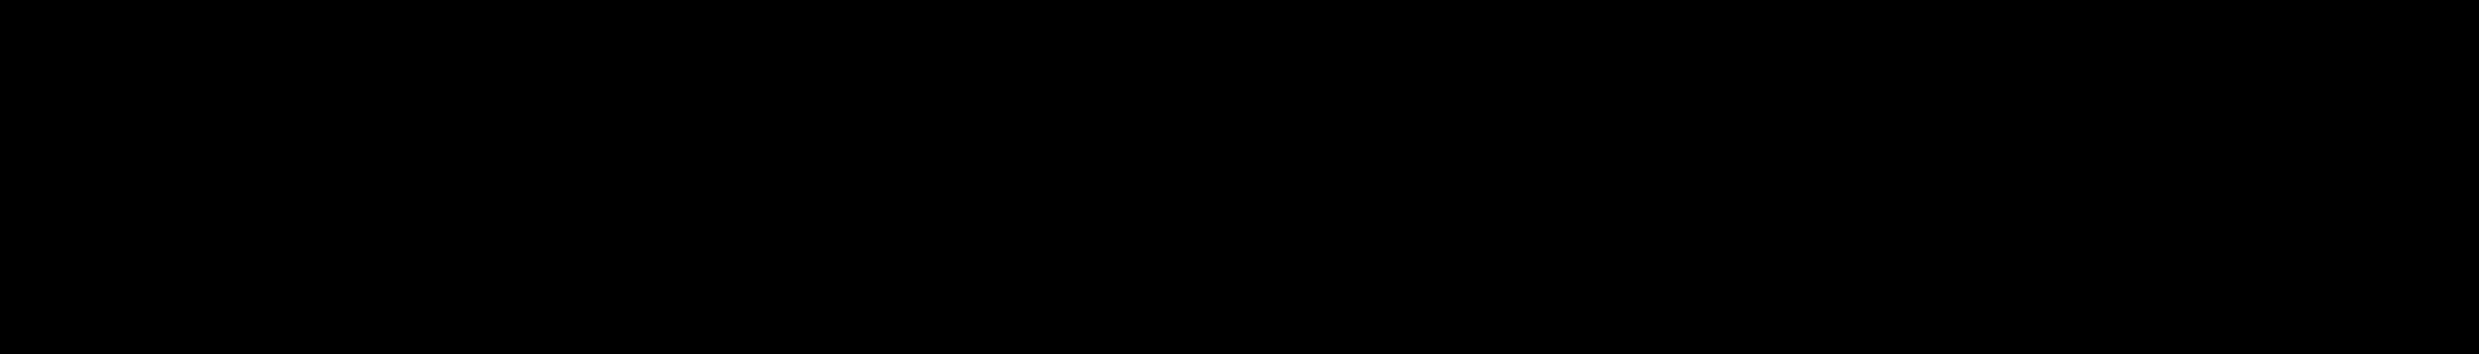 Barter1 GmbH